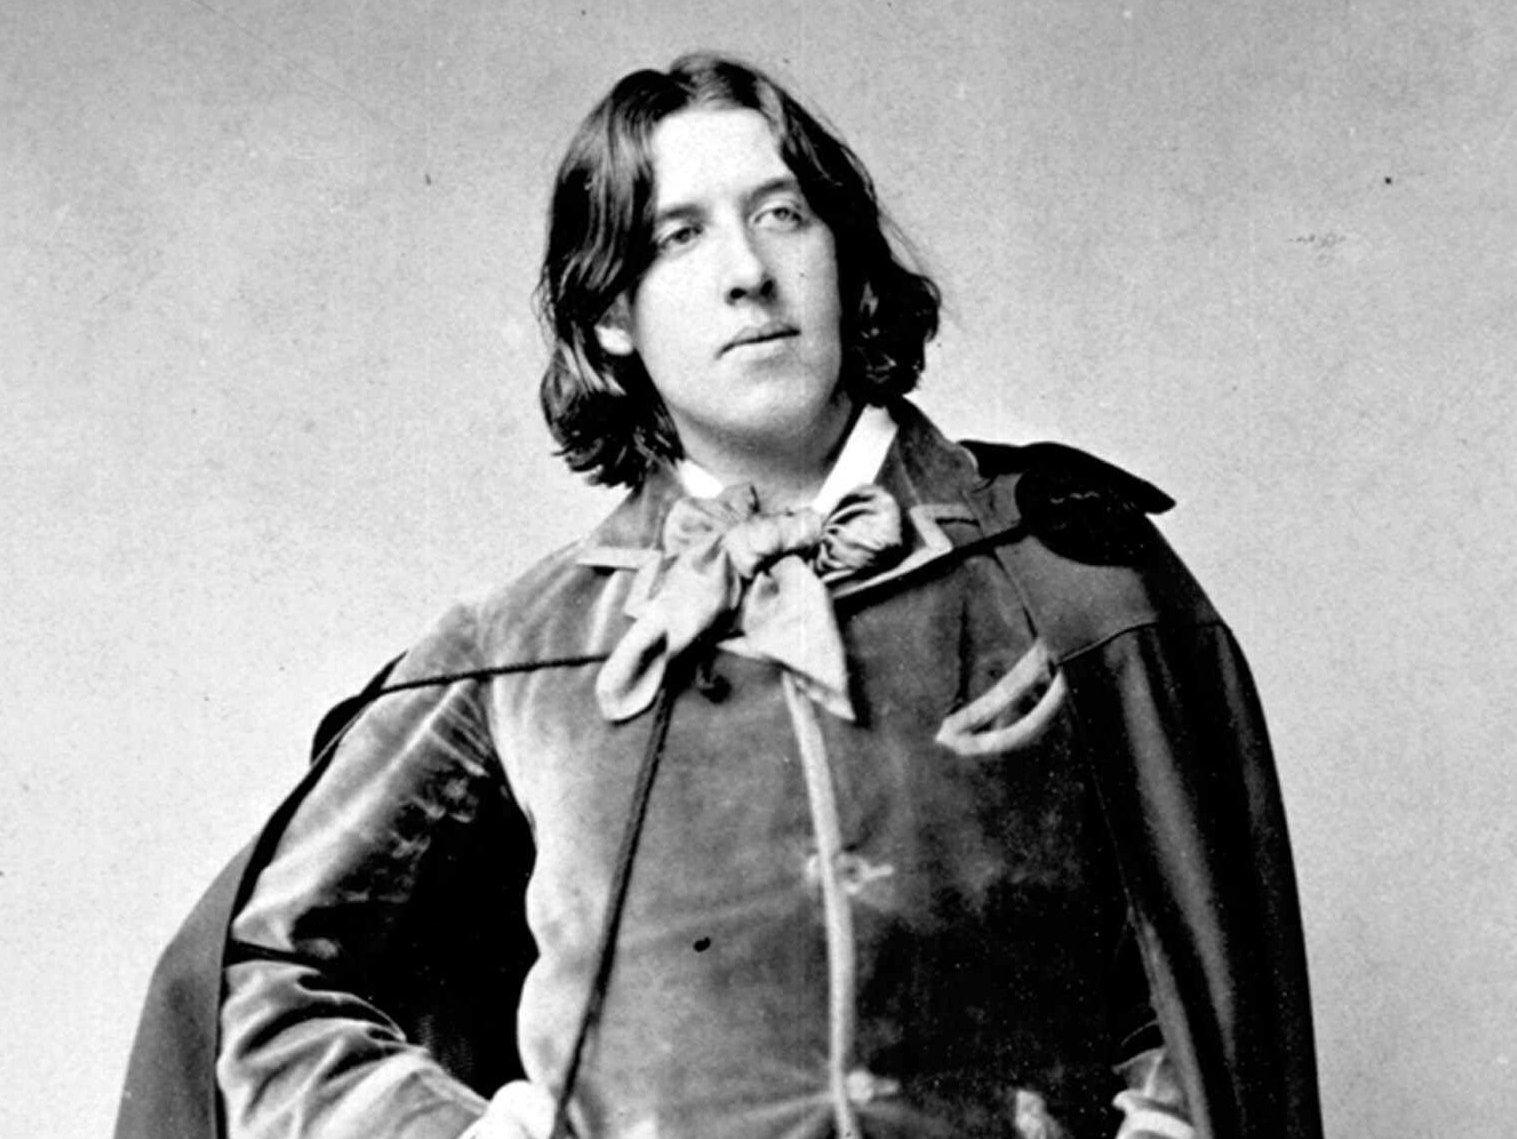 Book News: Newly Found Oscar Wilde Letter: 'Sacrifice For Your Art'